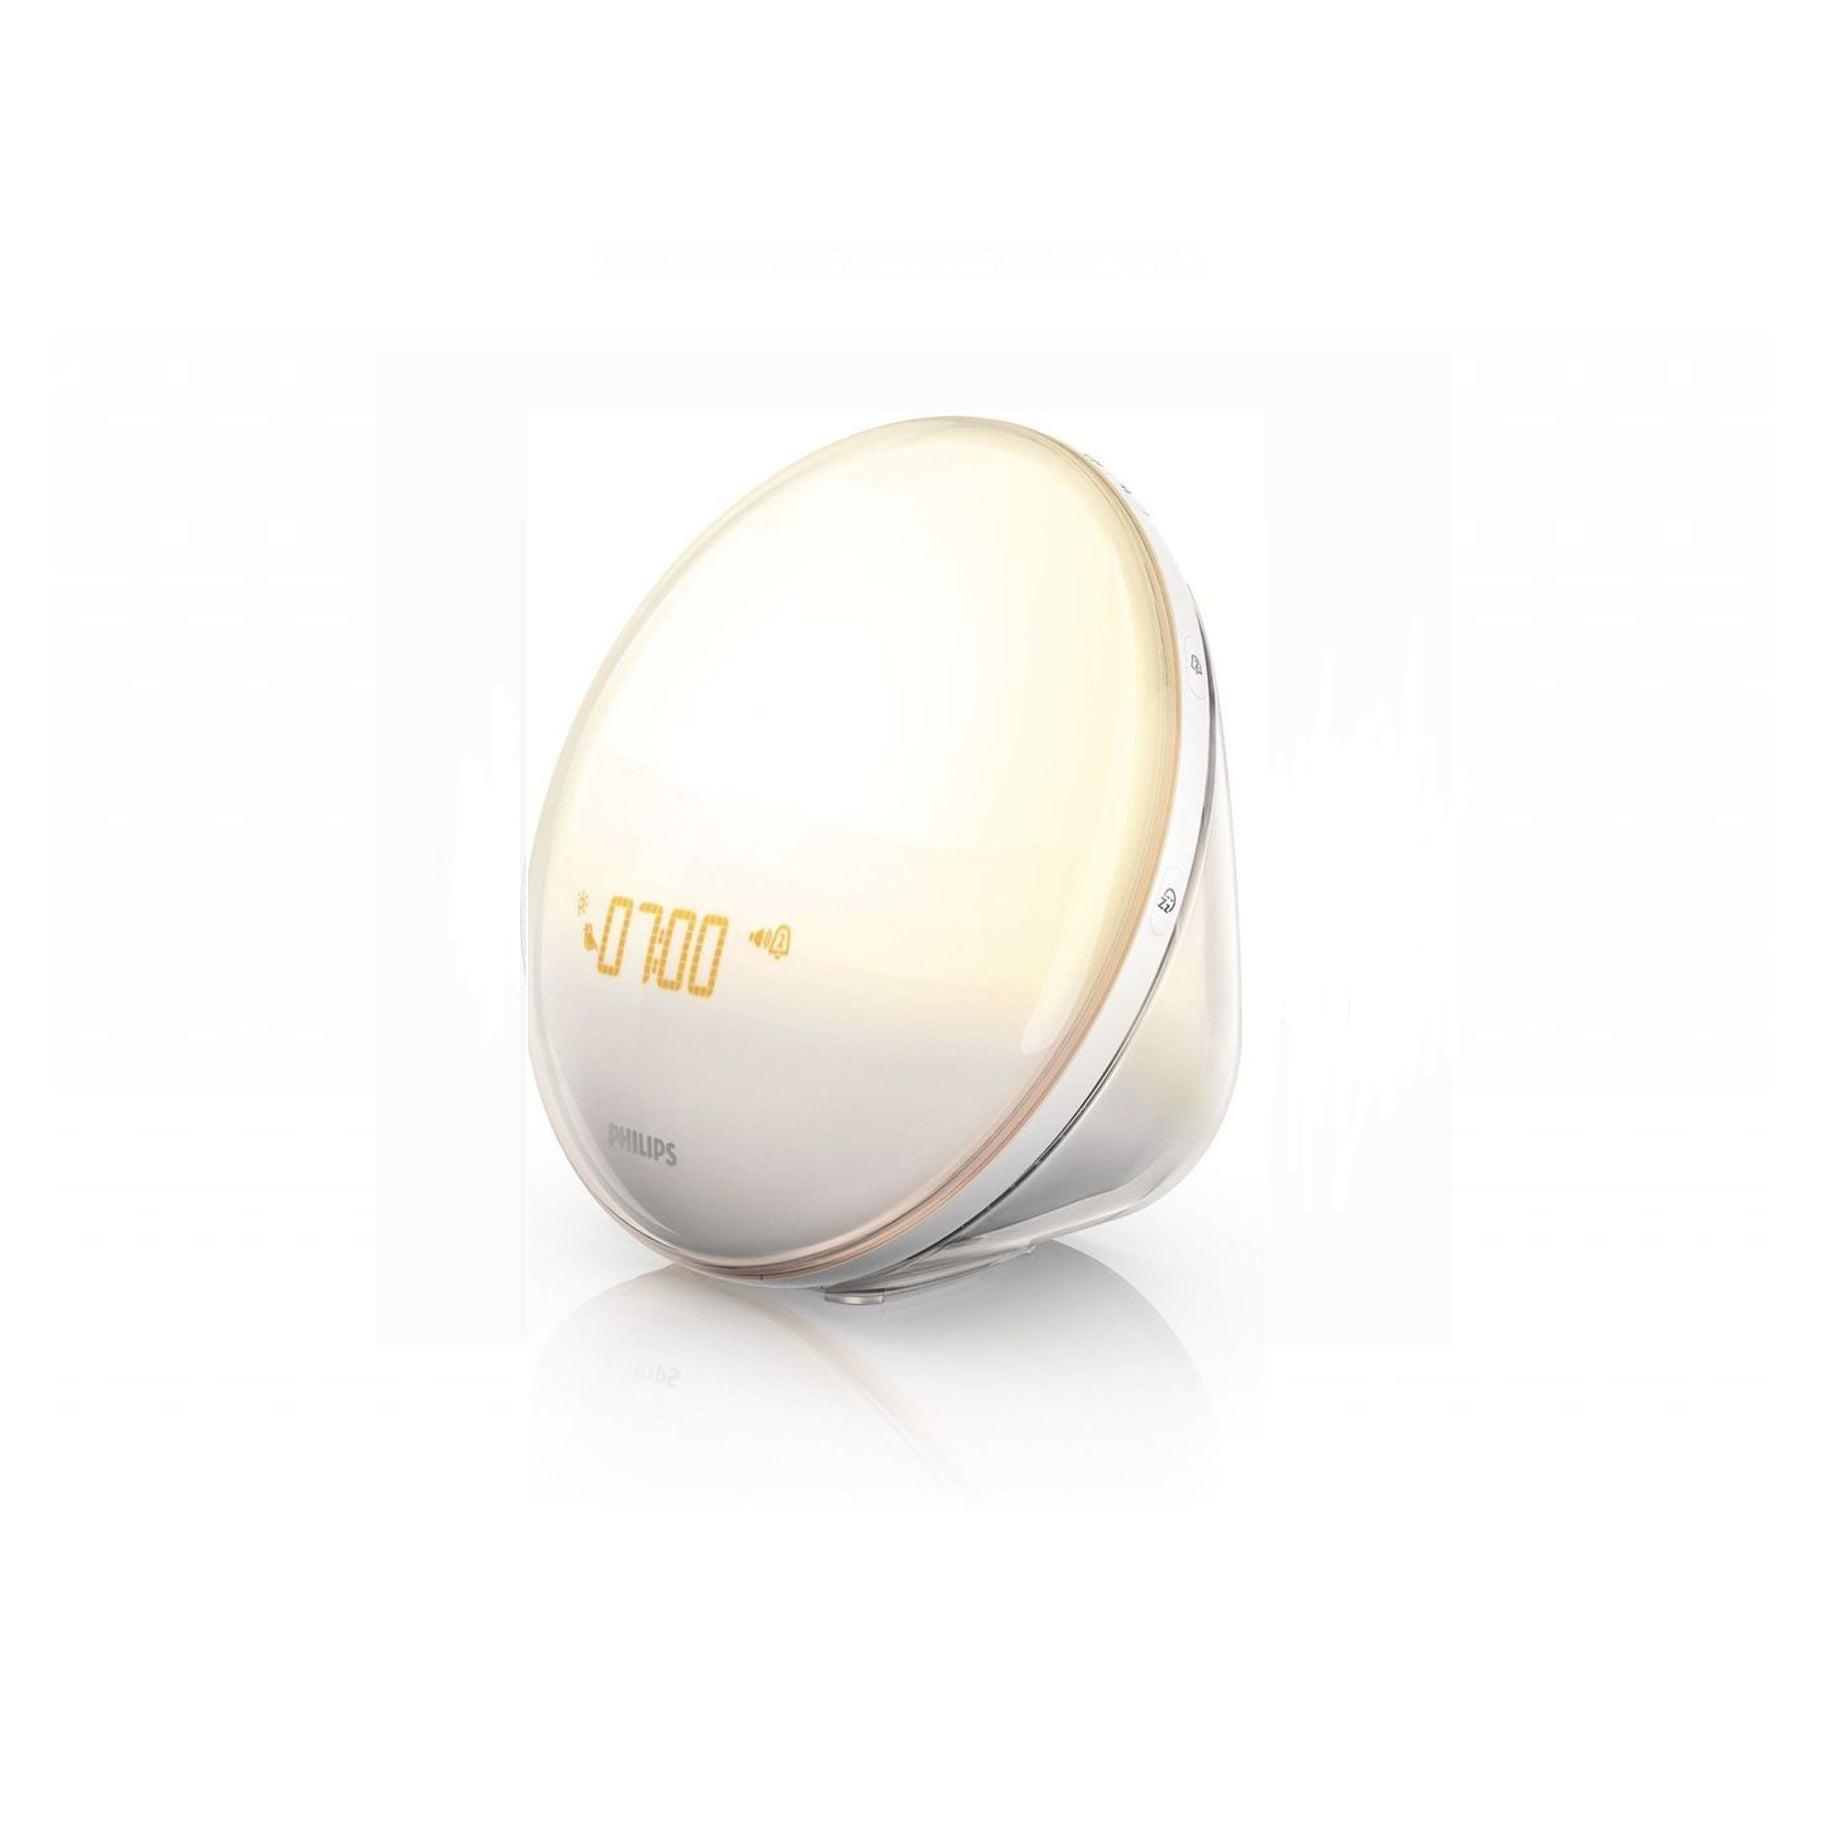 The-Best-Alarm-Clock-Option-Philips-SmartSleep-Wake-up-Light